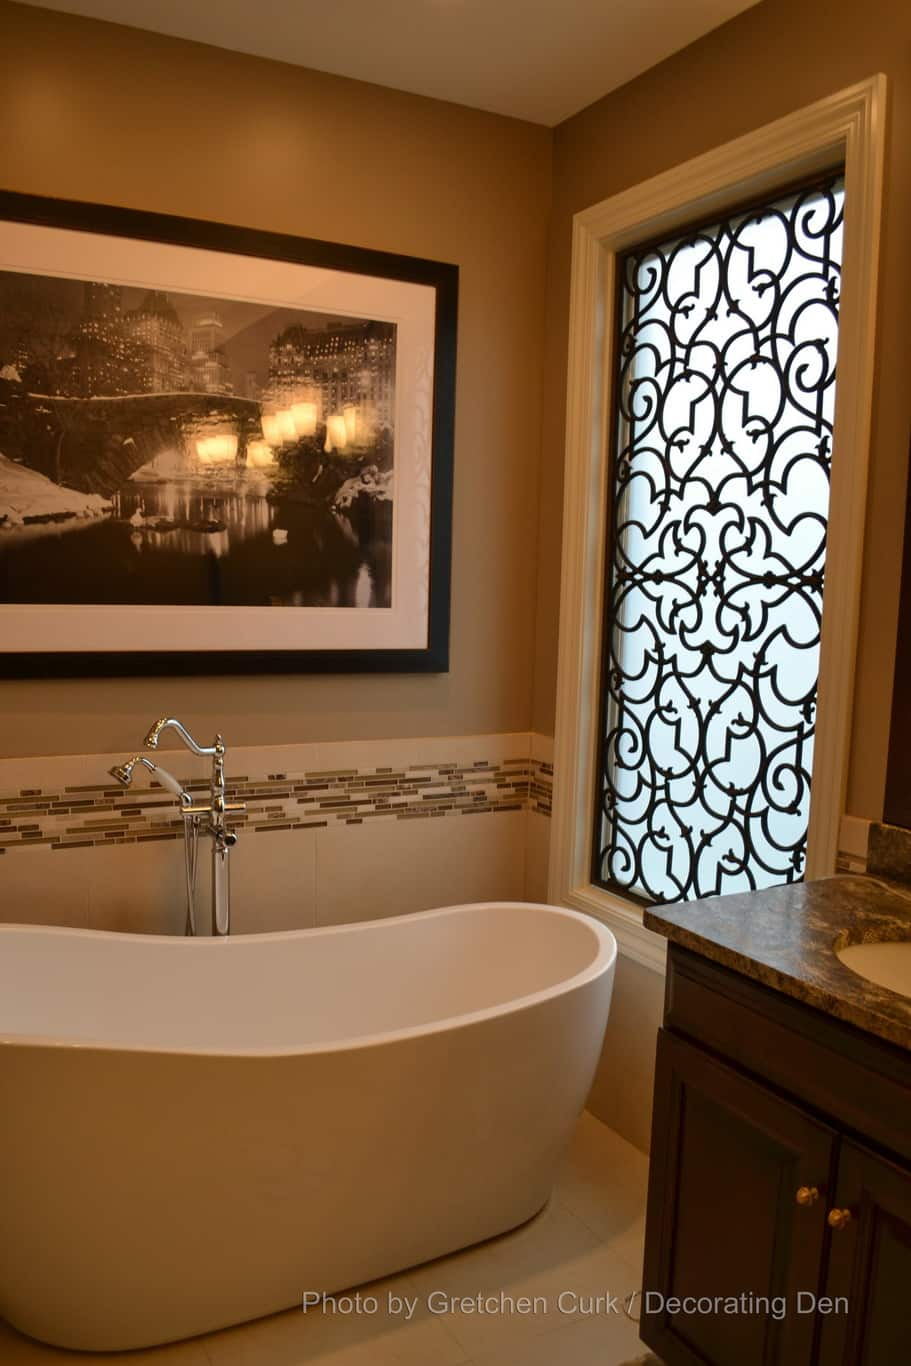 tableaux-decorative-grilles-residential-home-decor-interior-decorating-window-treatment-faux-iron-collioure-848-antique-bronze-BB8-004.jpg